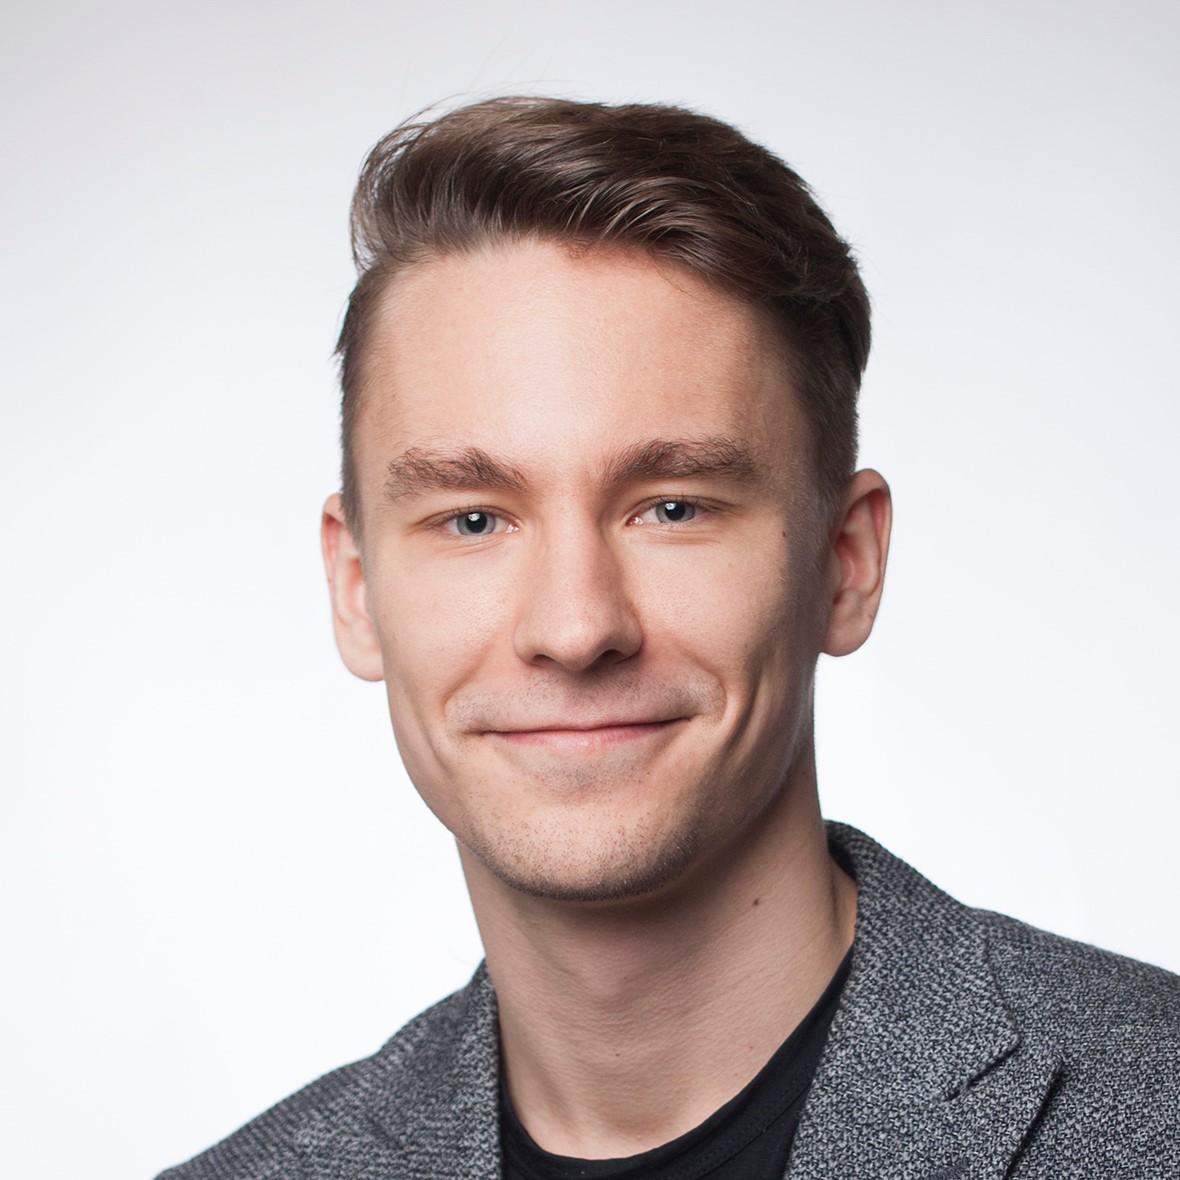 Mikael Karppinen | Machine Learning Engineer